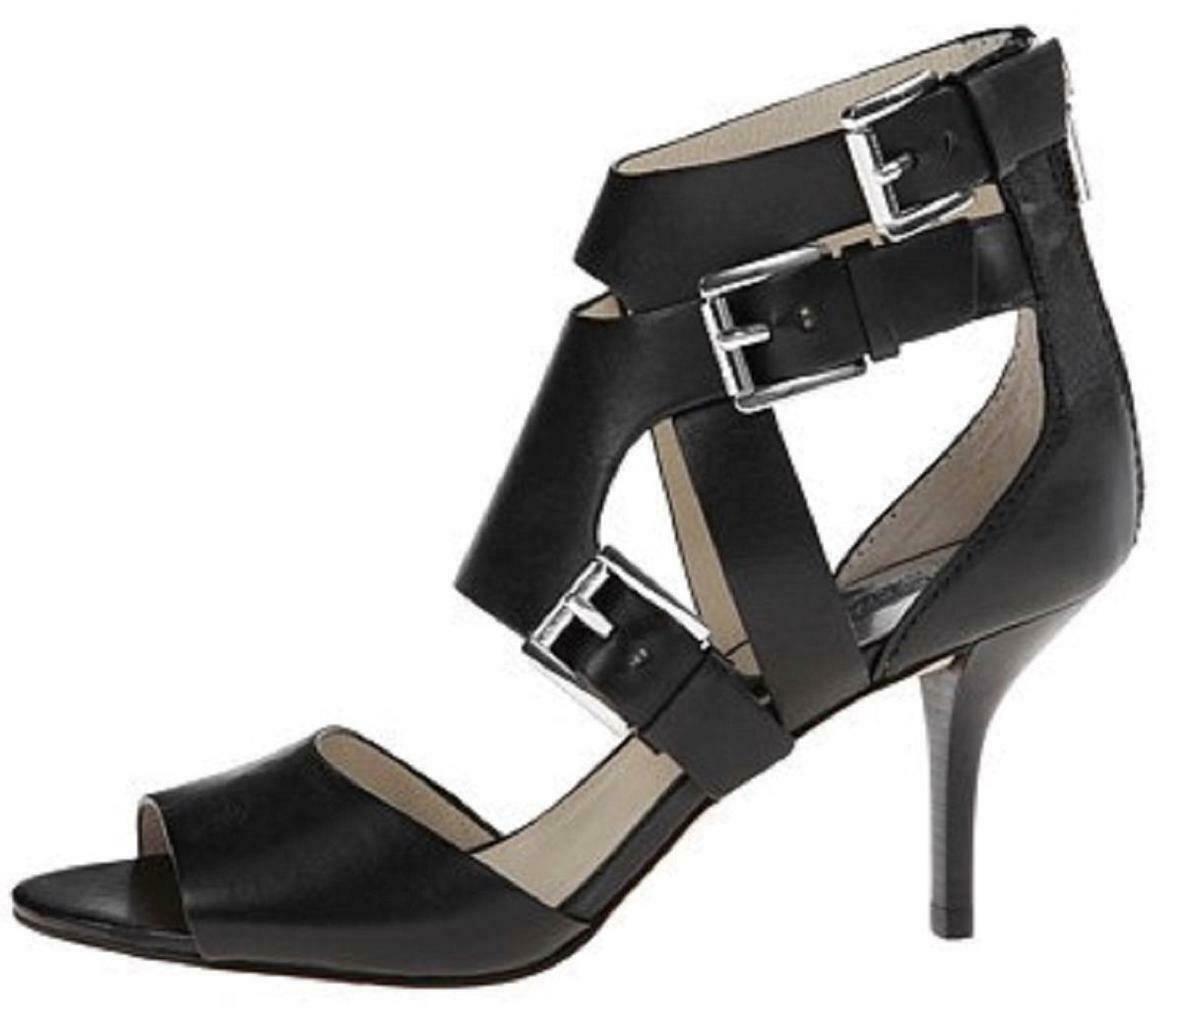 Women's Michael Kors LUCINDA OPEN TOE Heels Sandals Leather Black or Luggage image 2